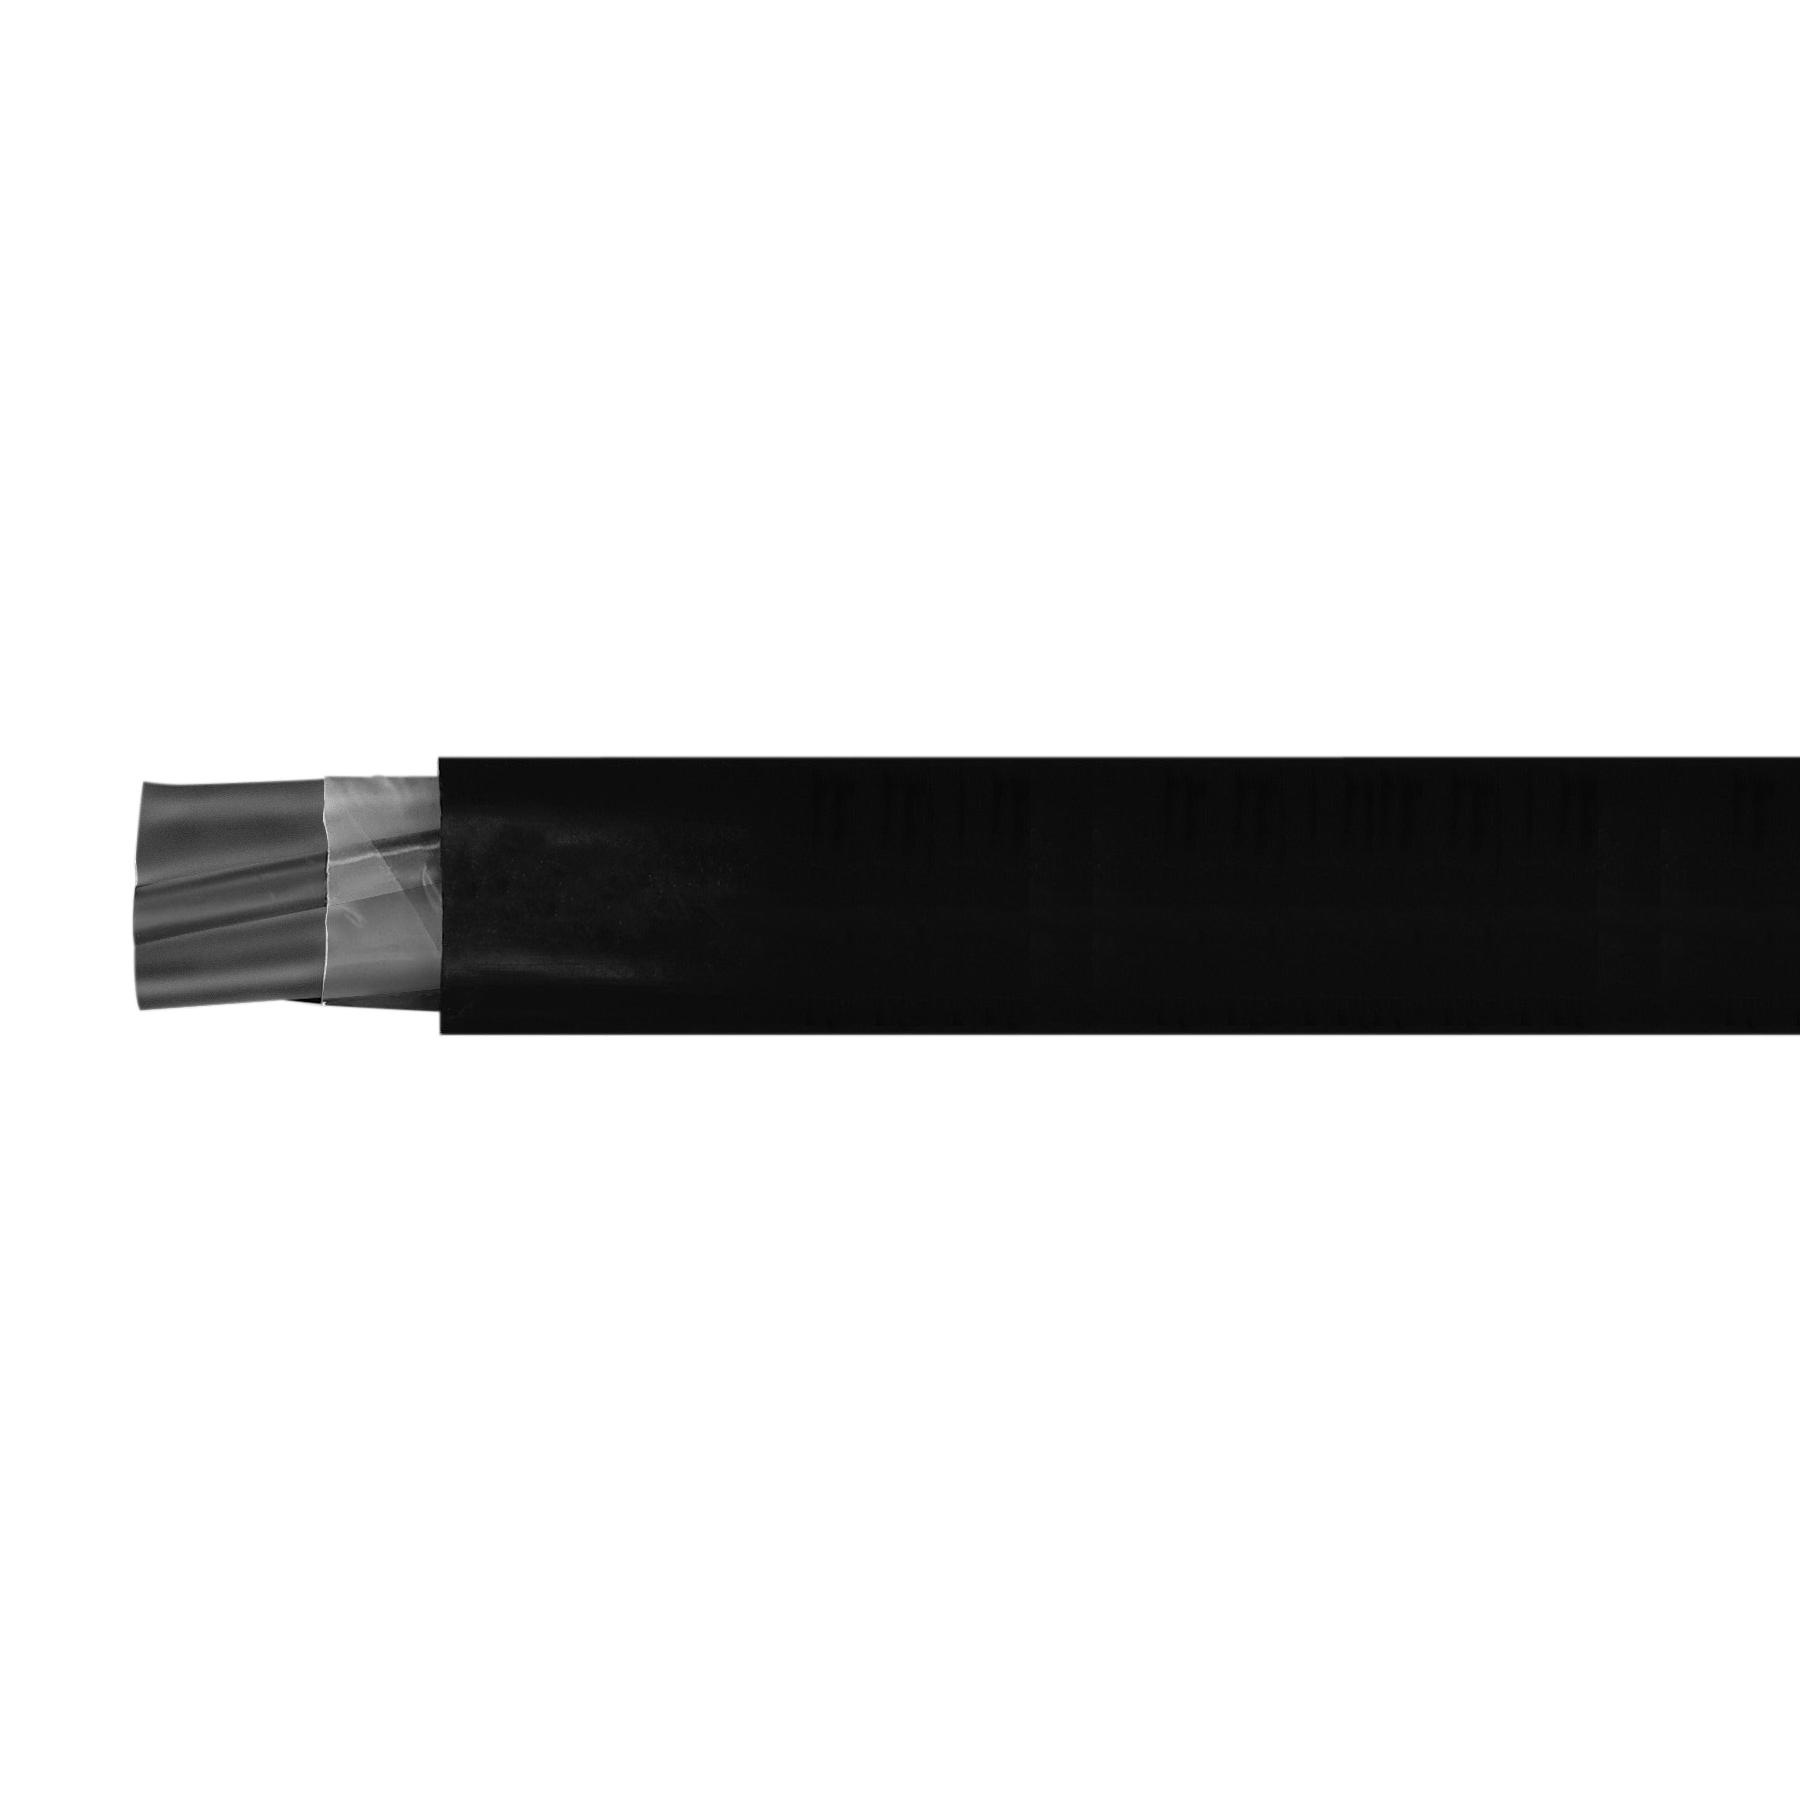 Omni Cable A32/003 Stranded Bare Copper Method 4 Color Code Tray ...